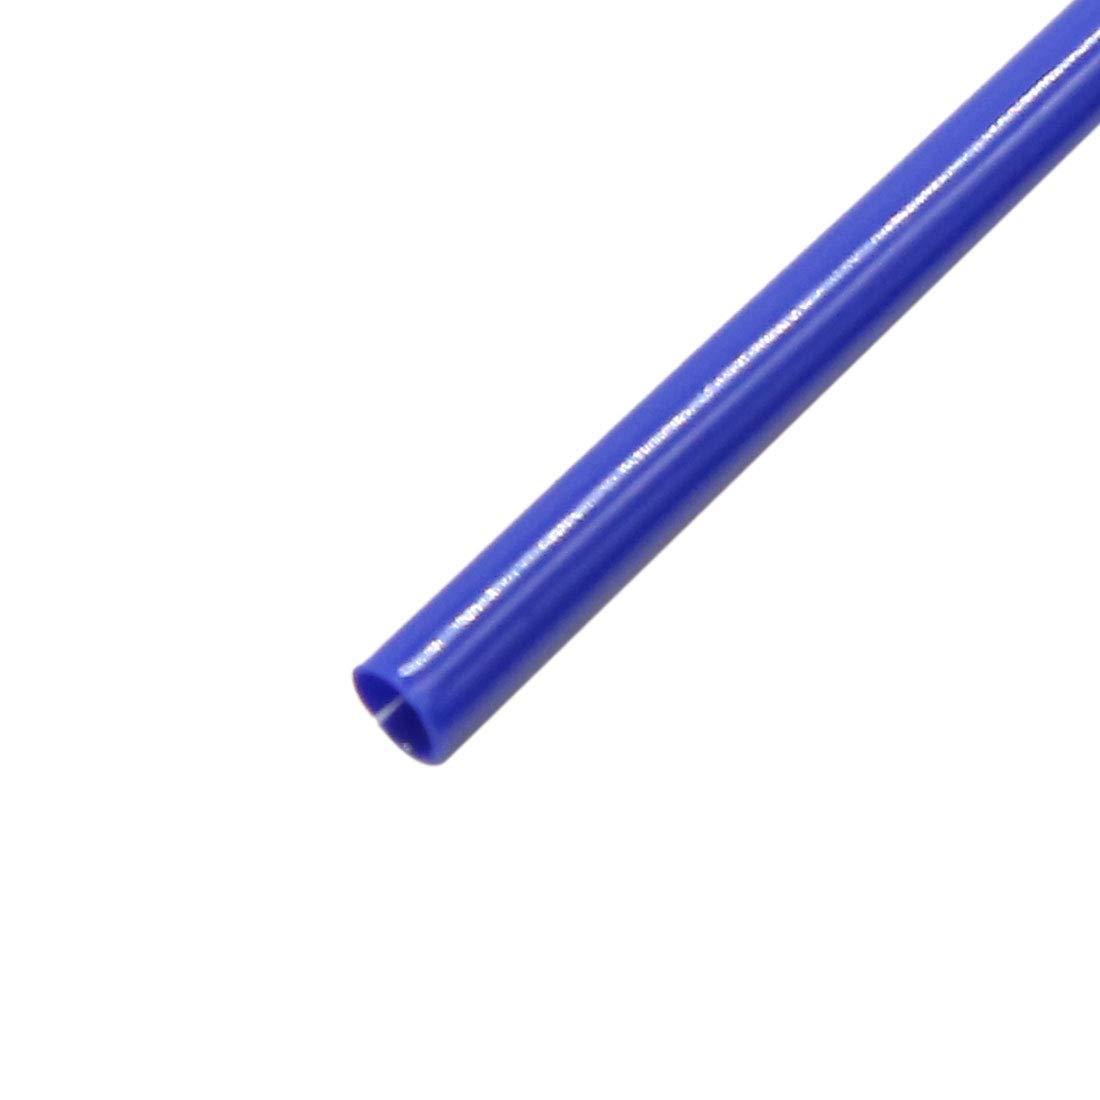 sourcing map 72pcs 23.5cm Length Motorcycle Wheel Steel Wire Spoke Reflective Clip Tube Dark Blue